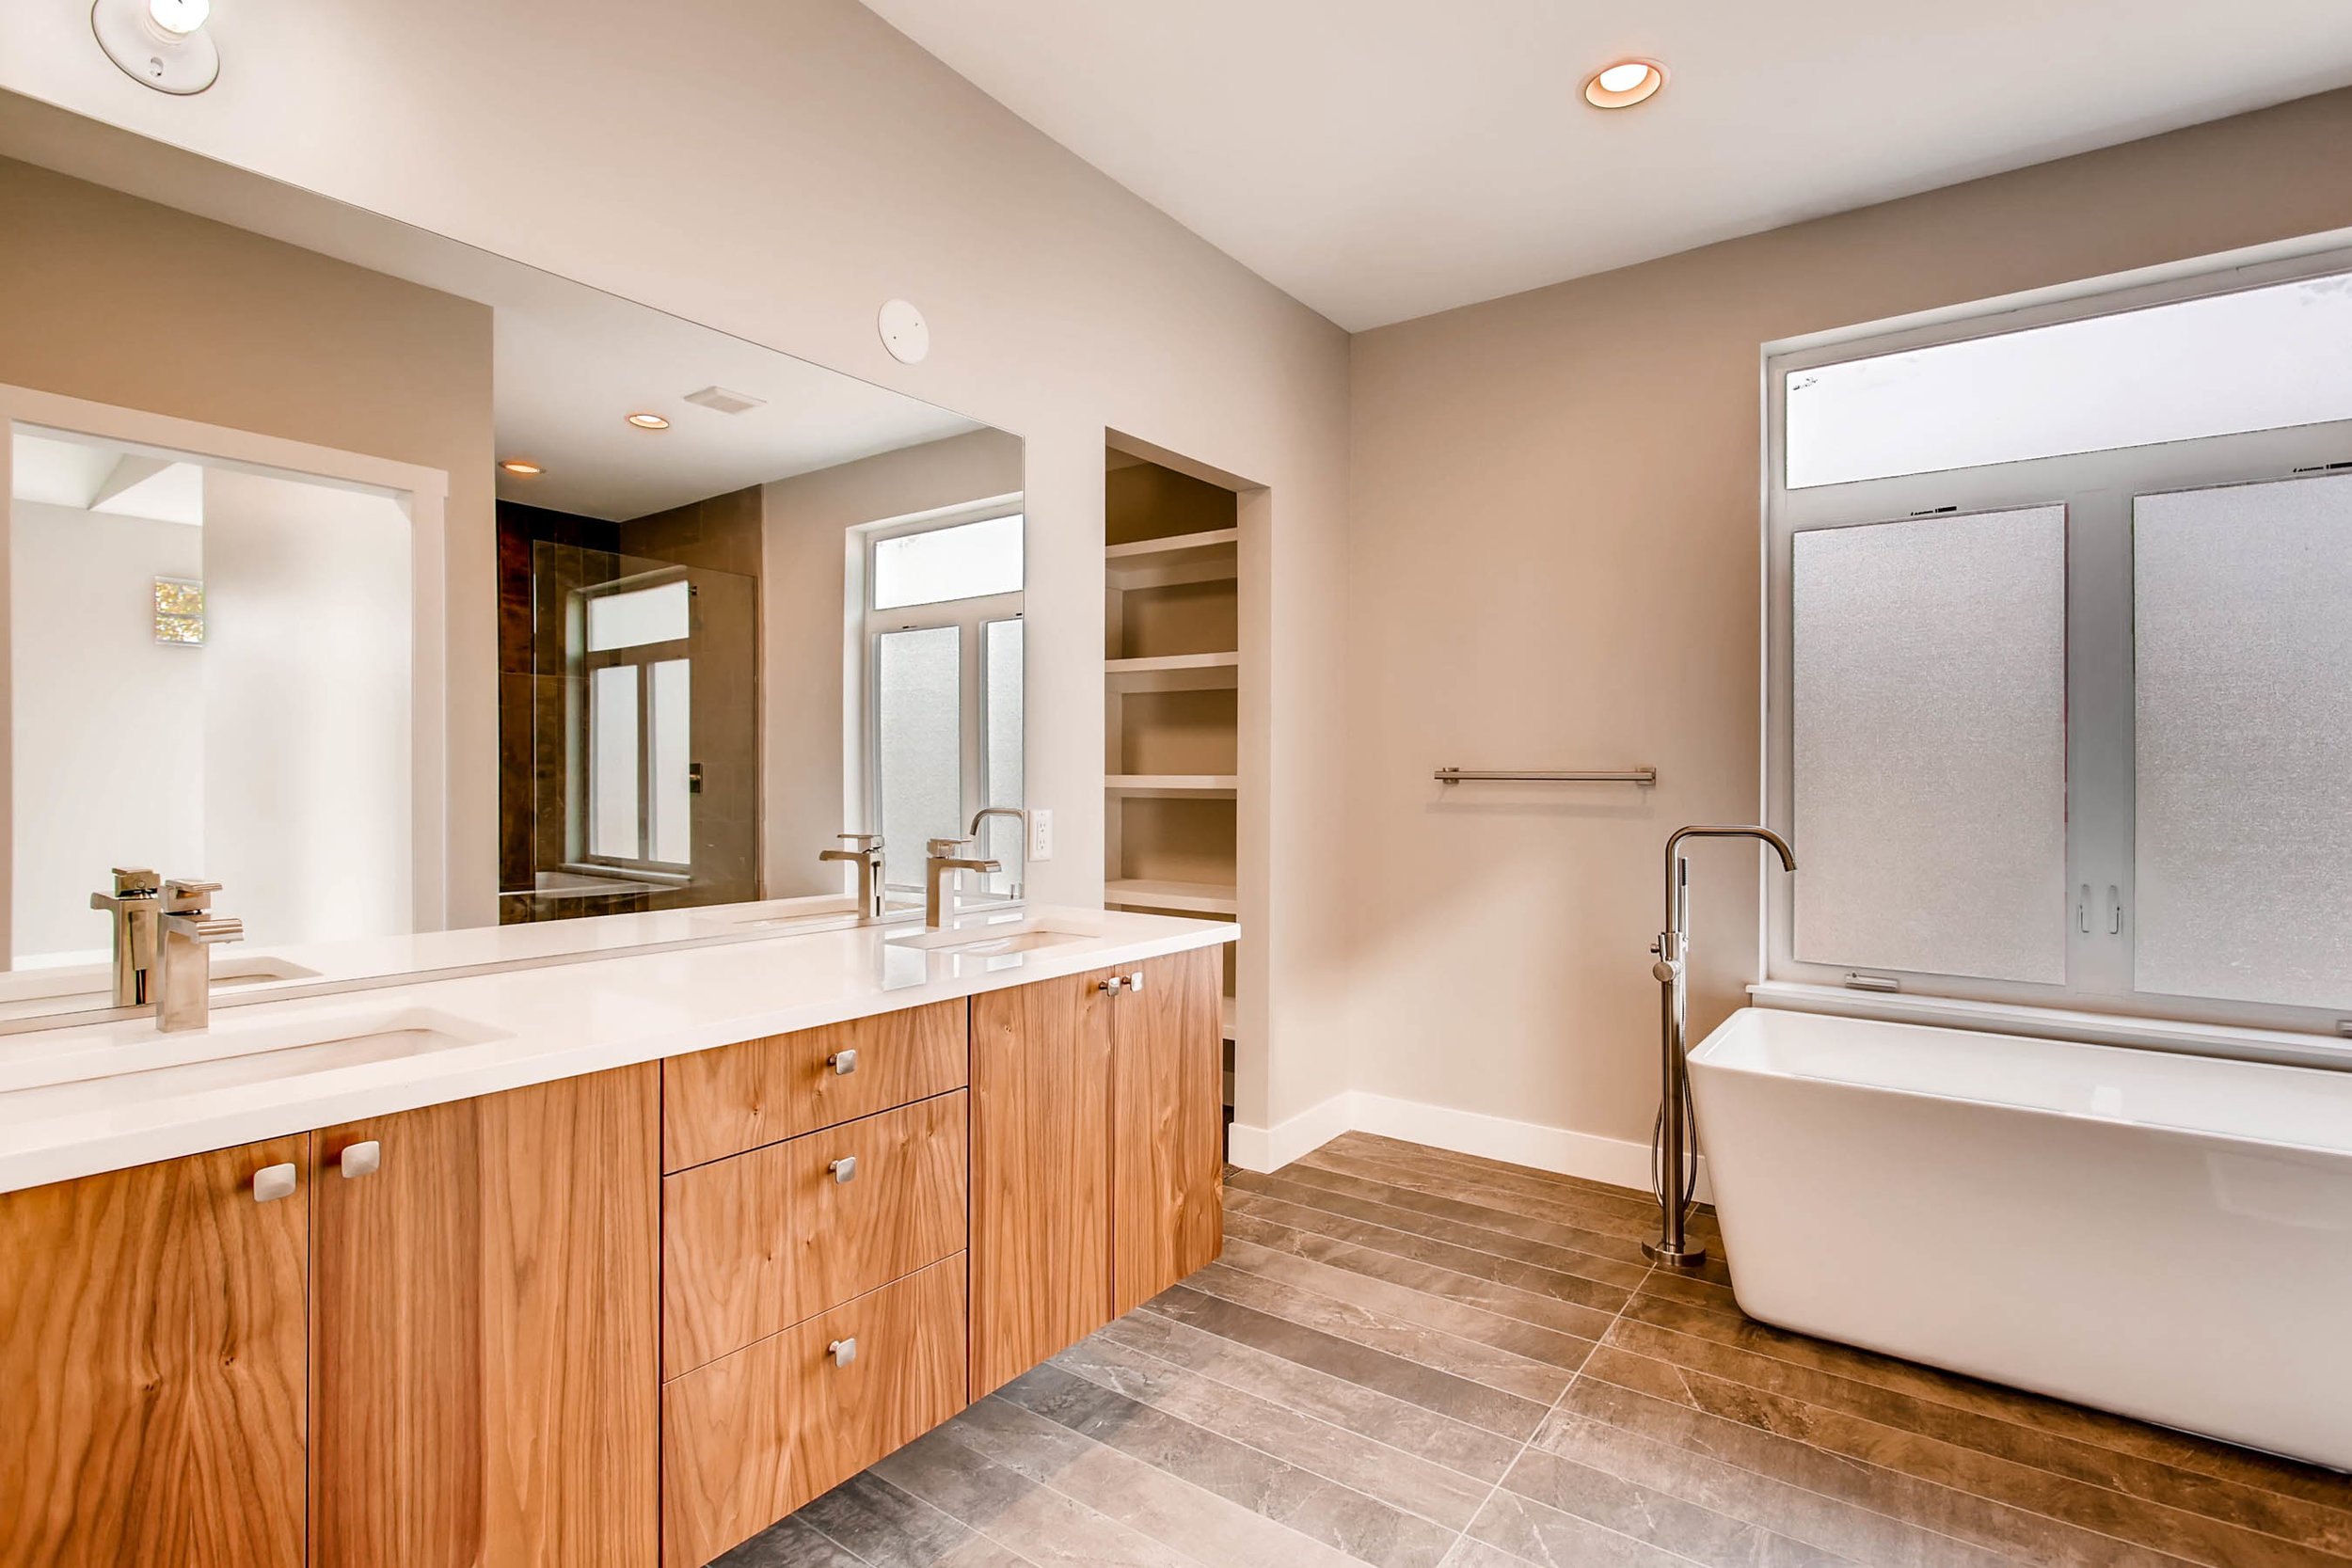 3050 Tennyson Denver CO 80212-print-016-8-2nd Floor Master Bathroom-2700x1800-300dpi.jpg